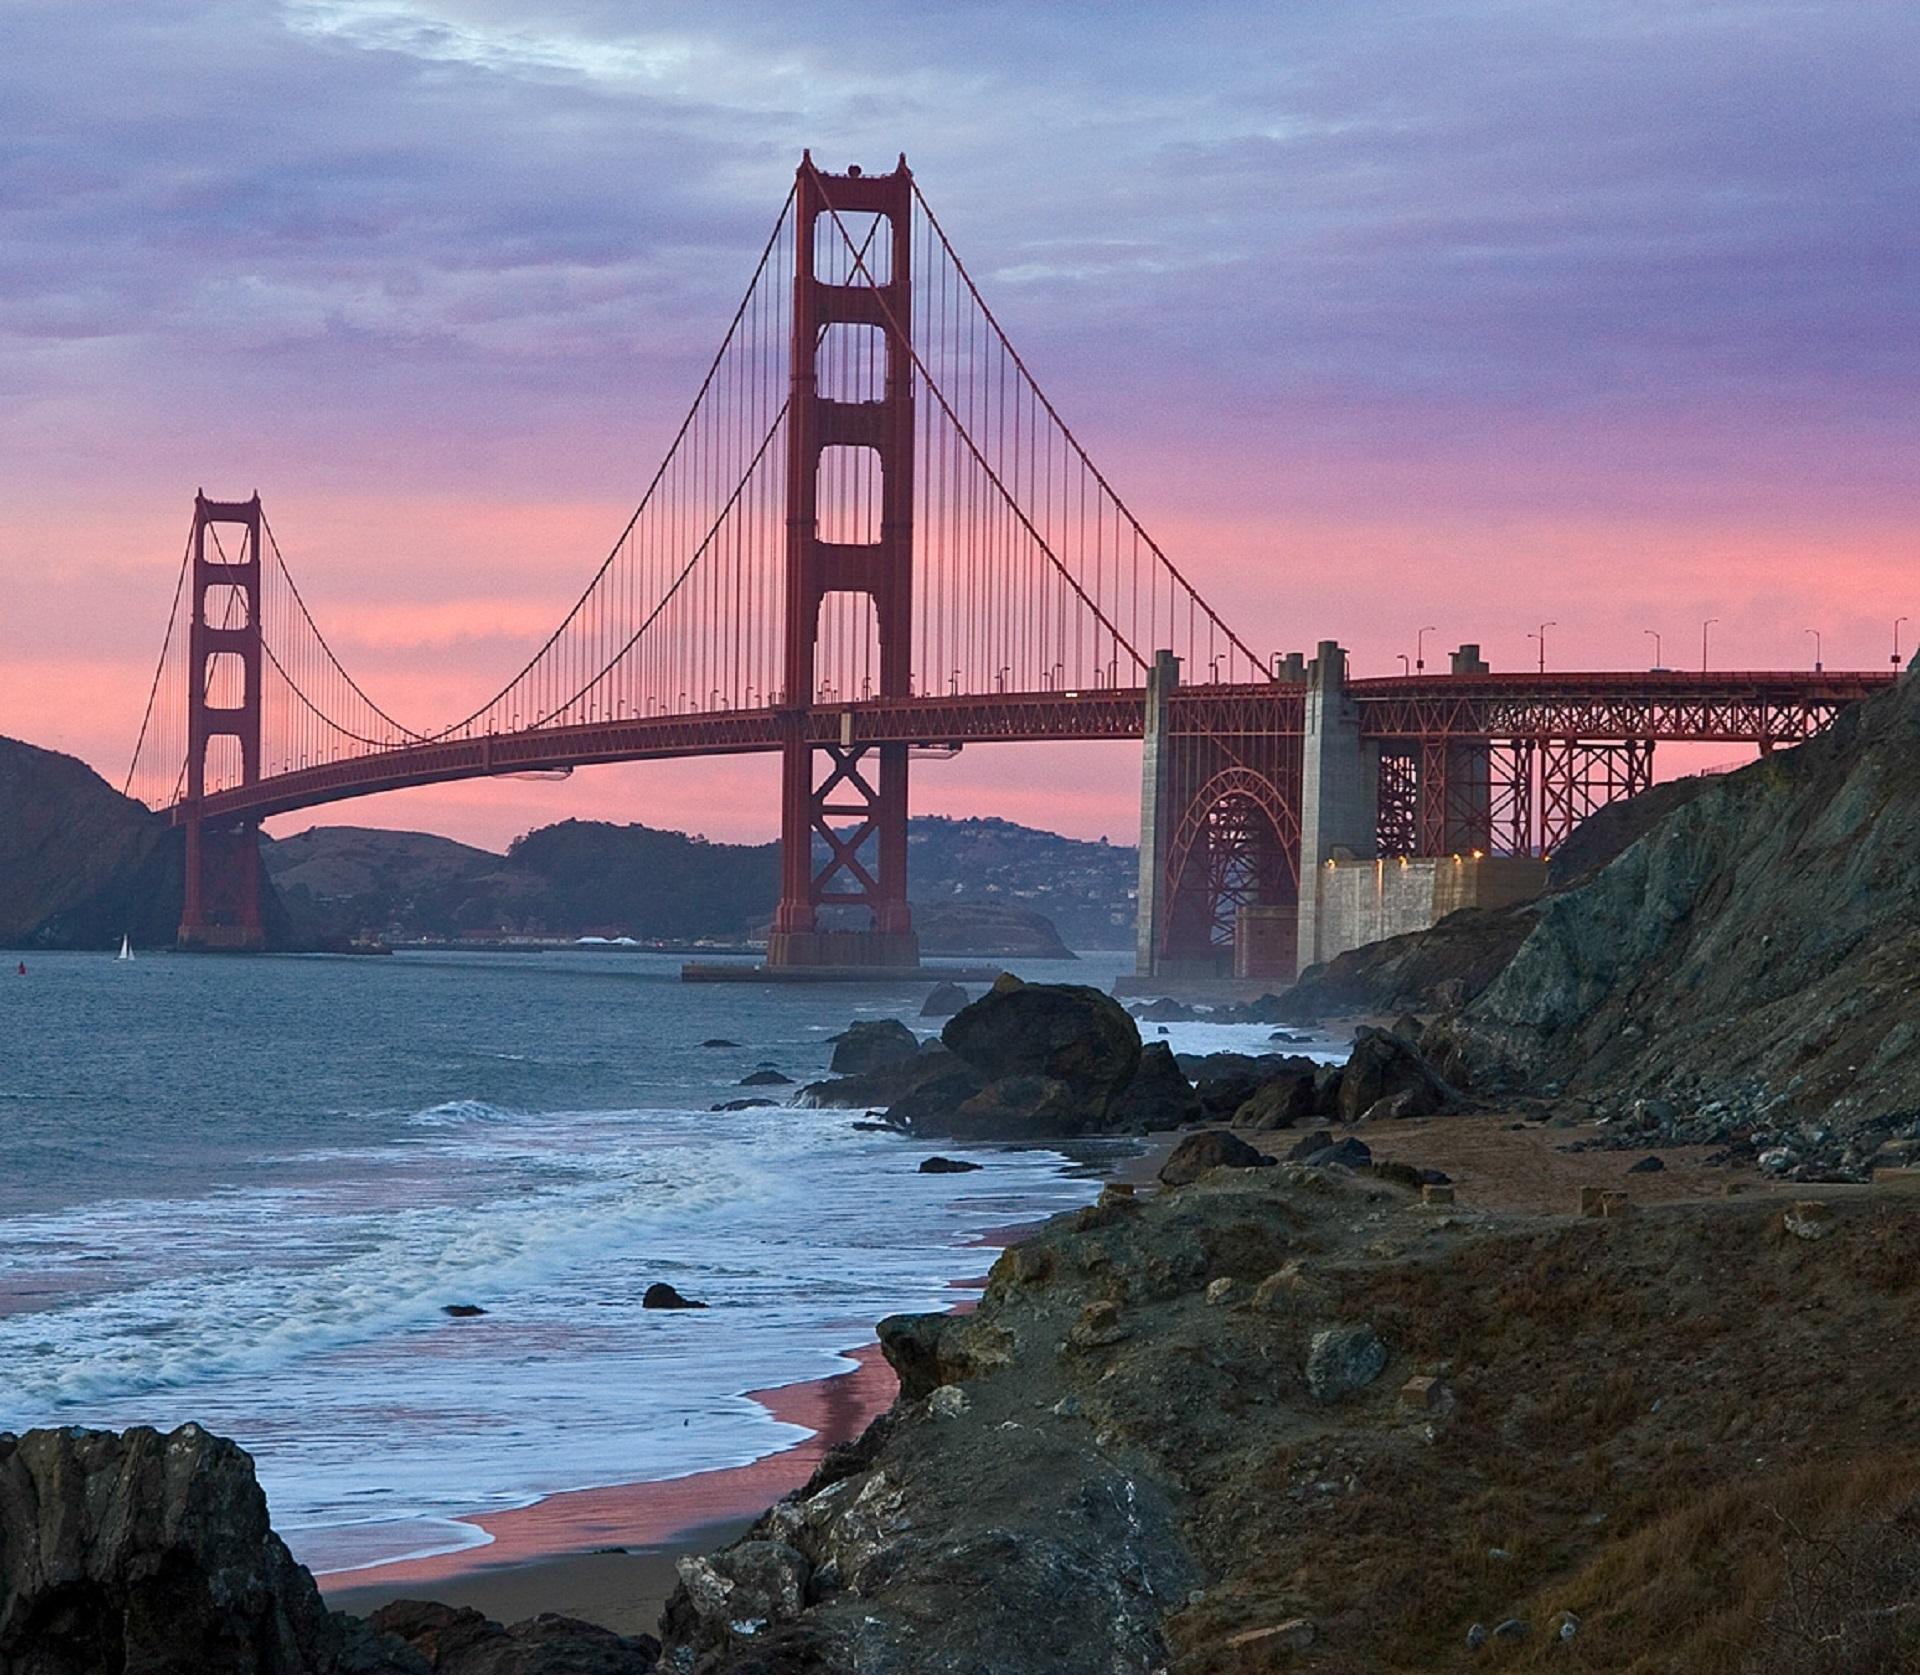 Golden Gate Bridge San Francisco California Sunset Picture: Free Images : Landscape, Sea, Coast, Water, Ocean